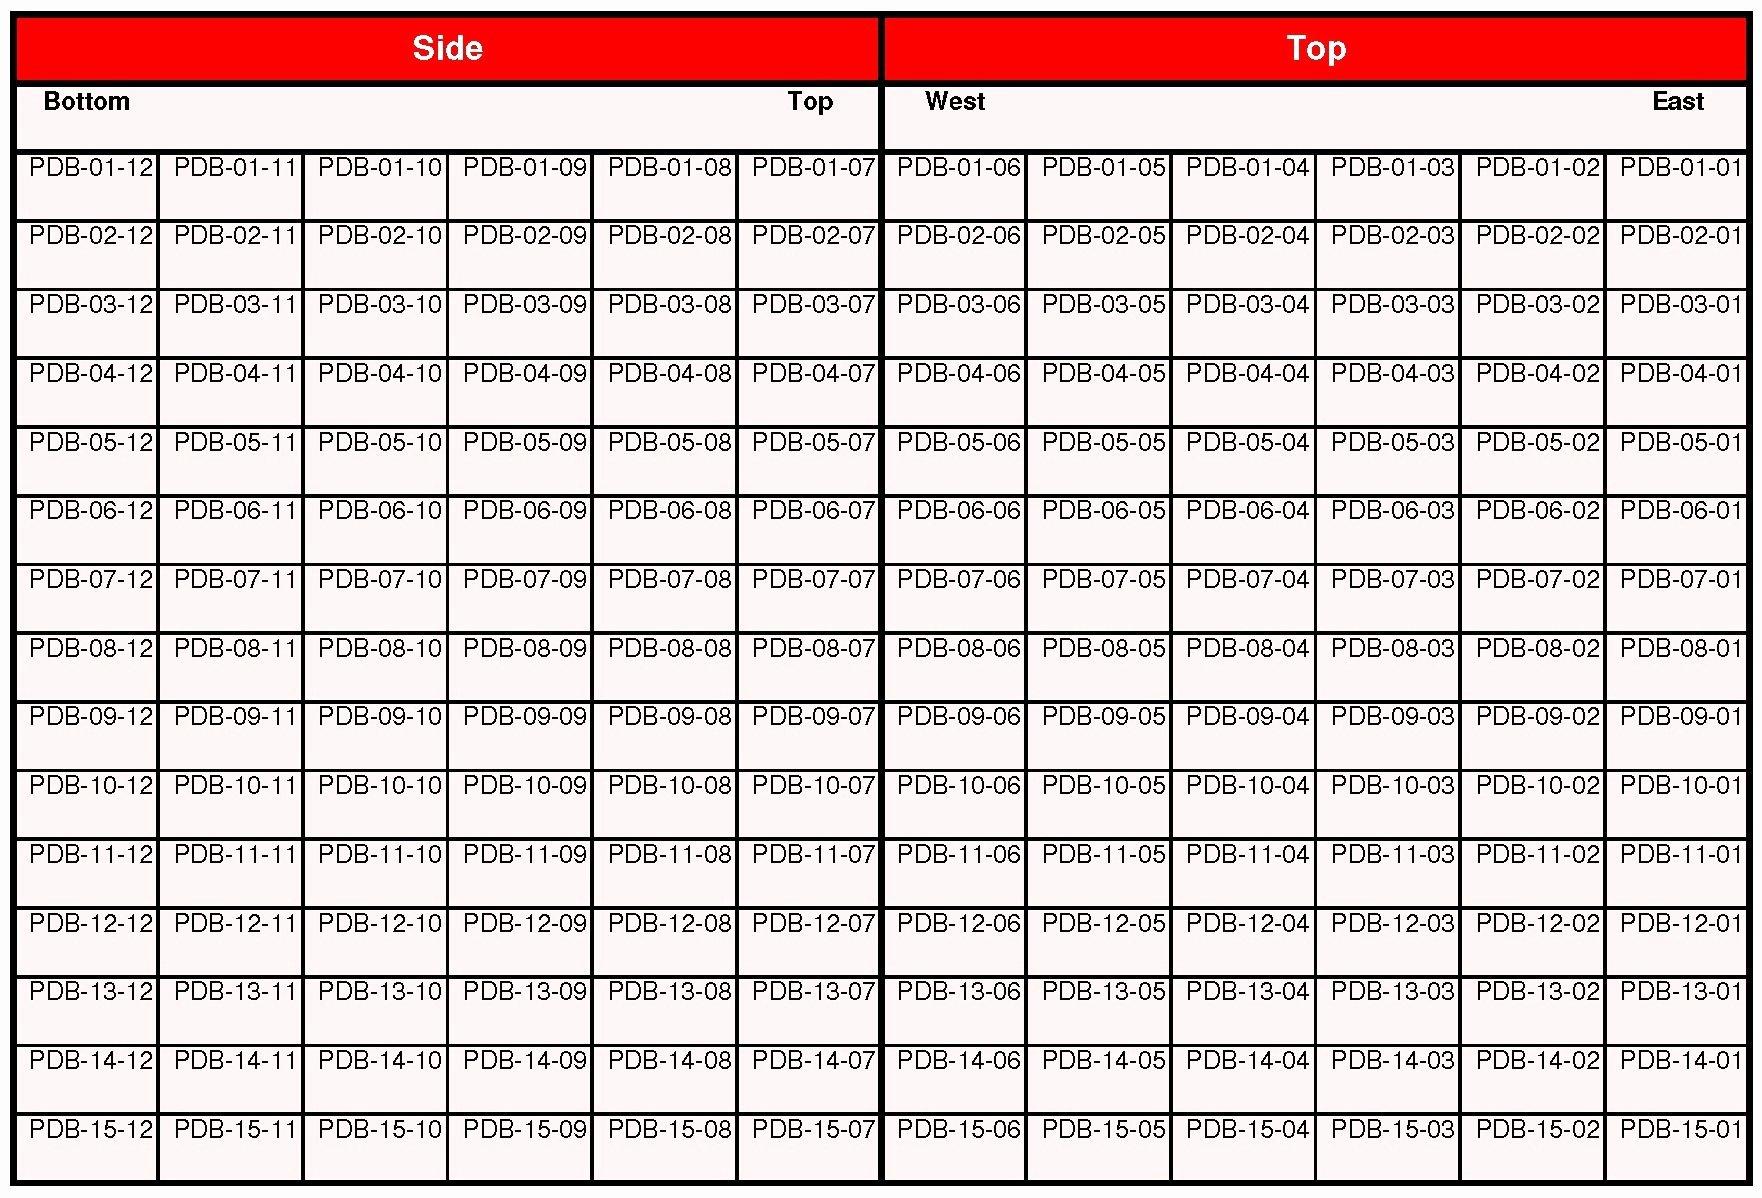 Circuit Breaker Panel Label Template Unique Circuit Breaker Panel Label Template Excel Heritage